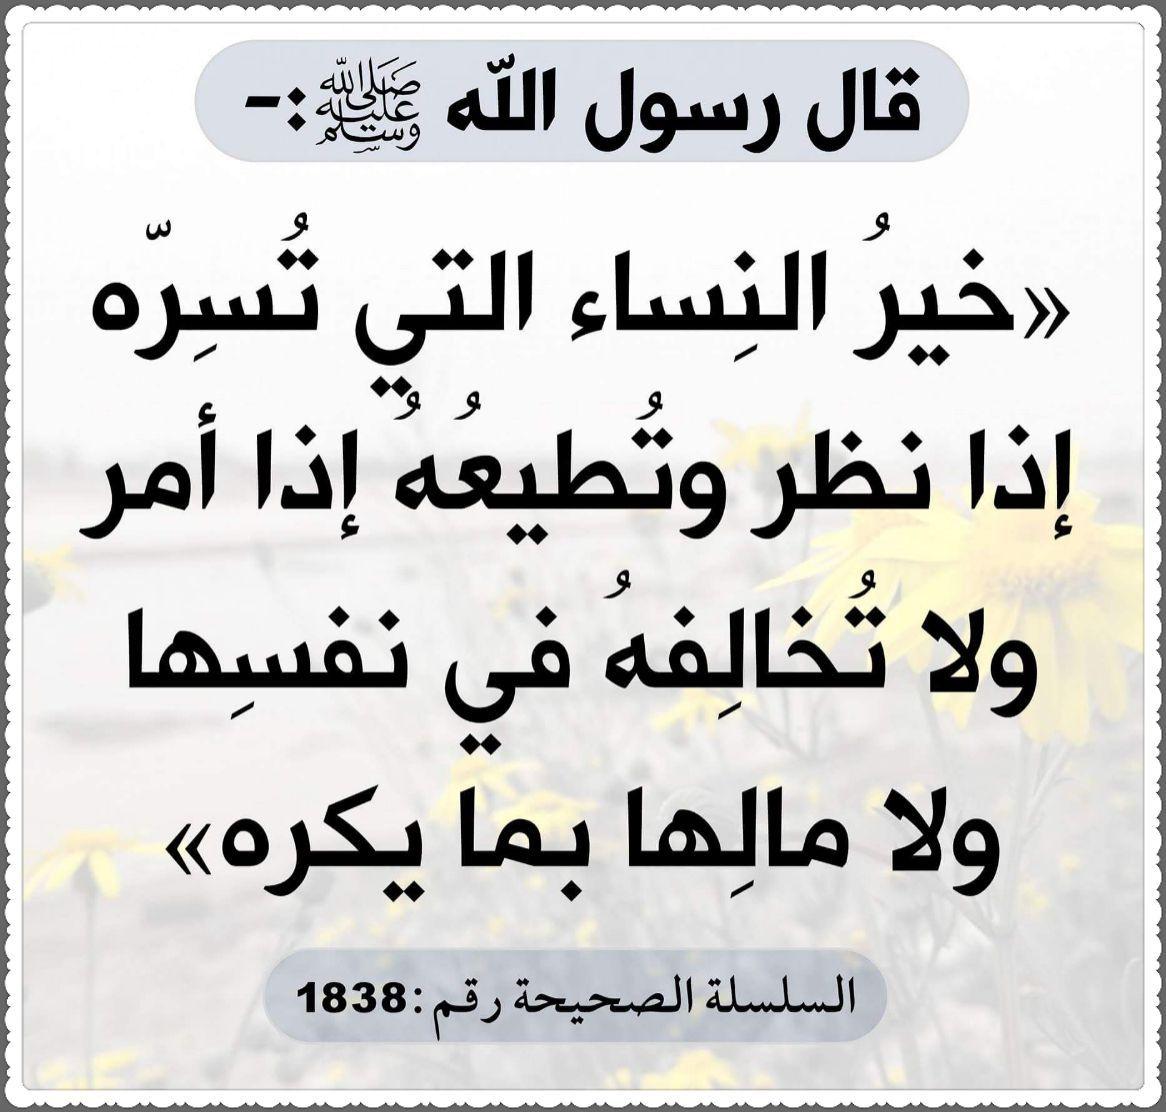 Pin By الأثر الجميل On أحاديث نبوية Good Morning Arabic Quotes Islam Quran